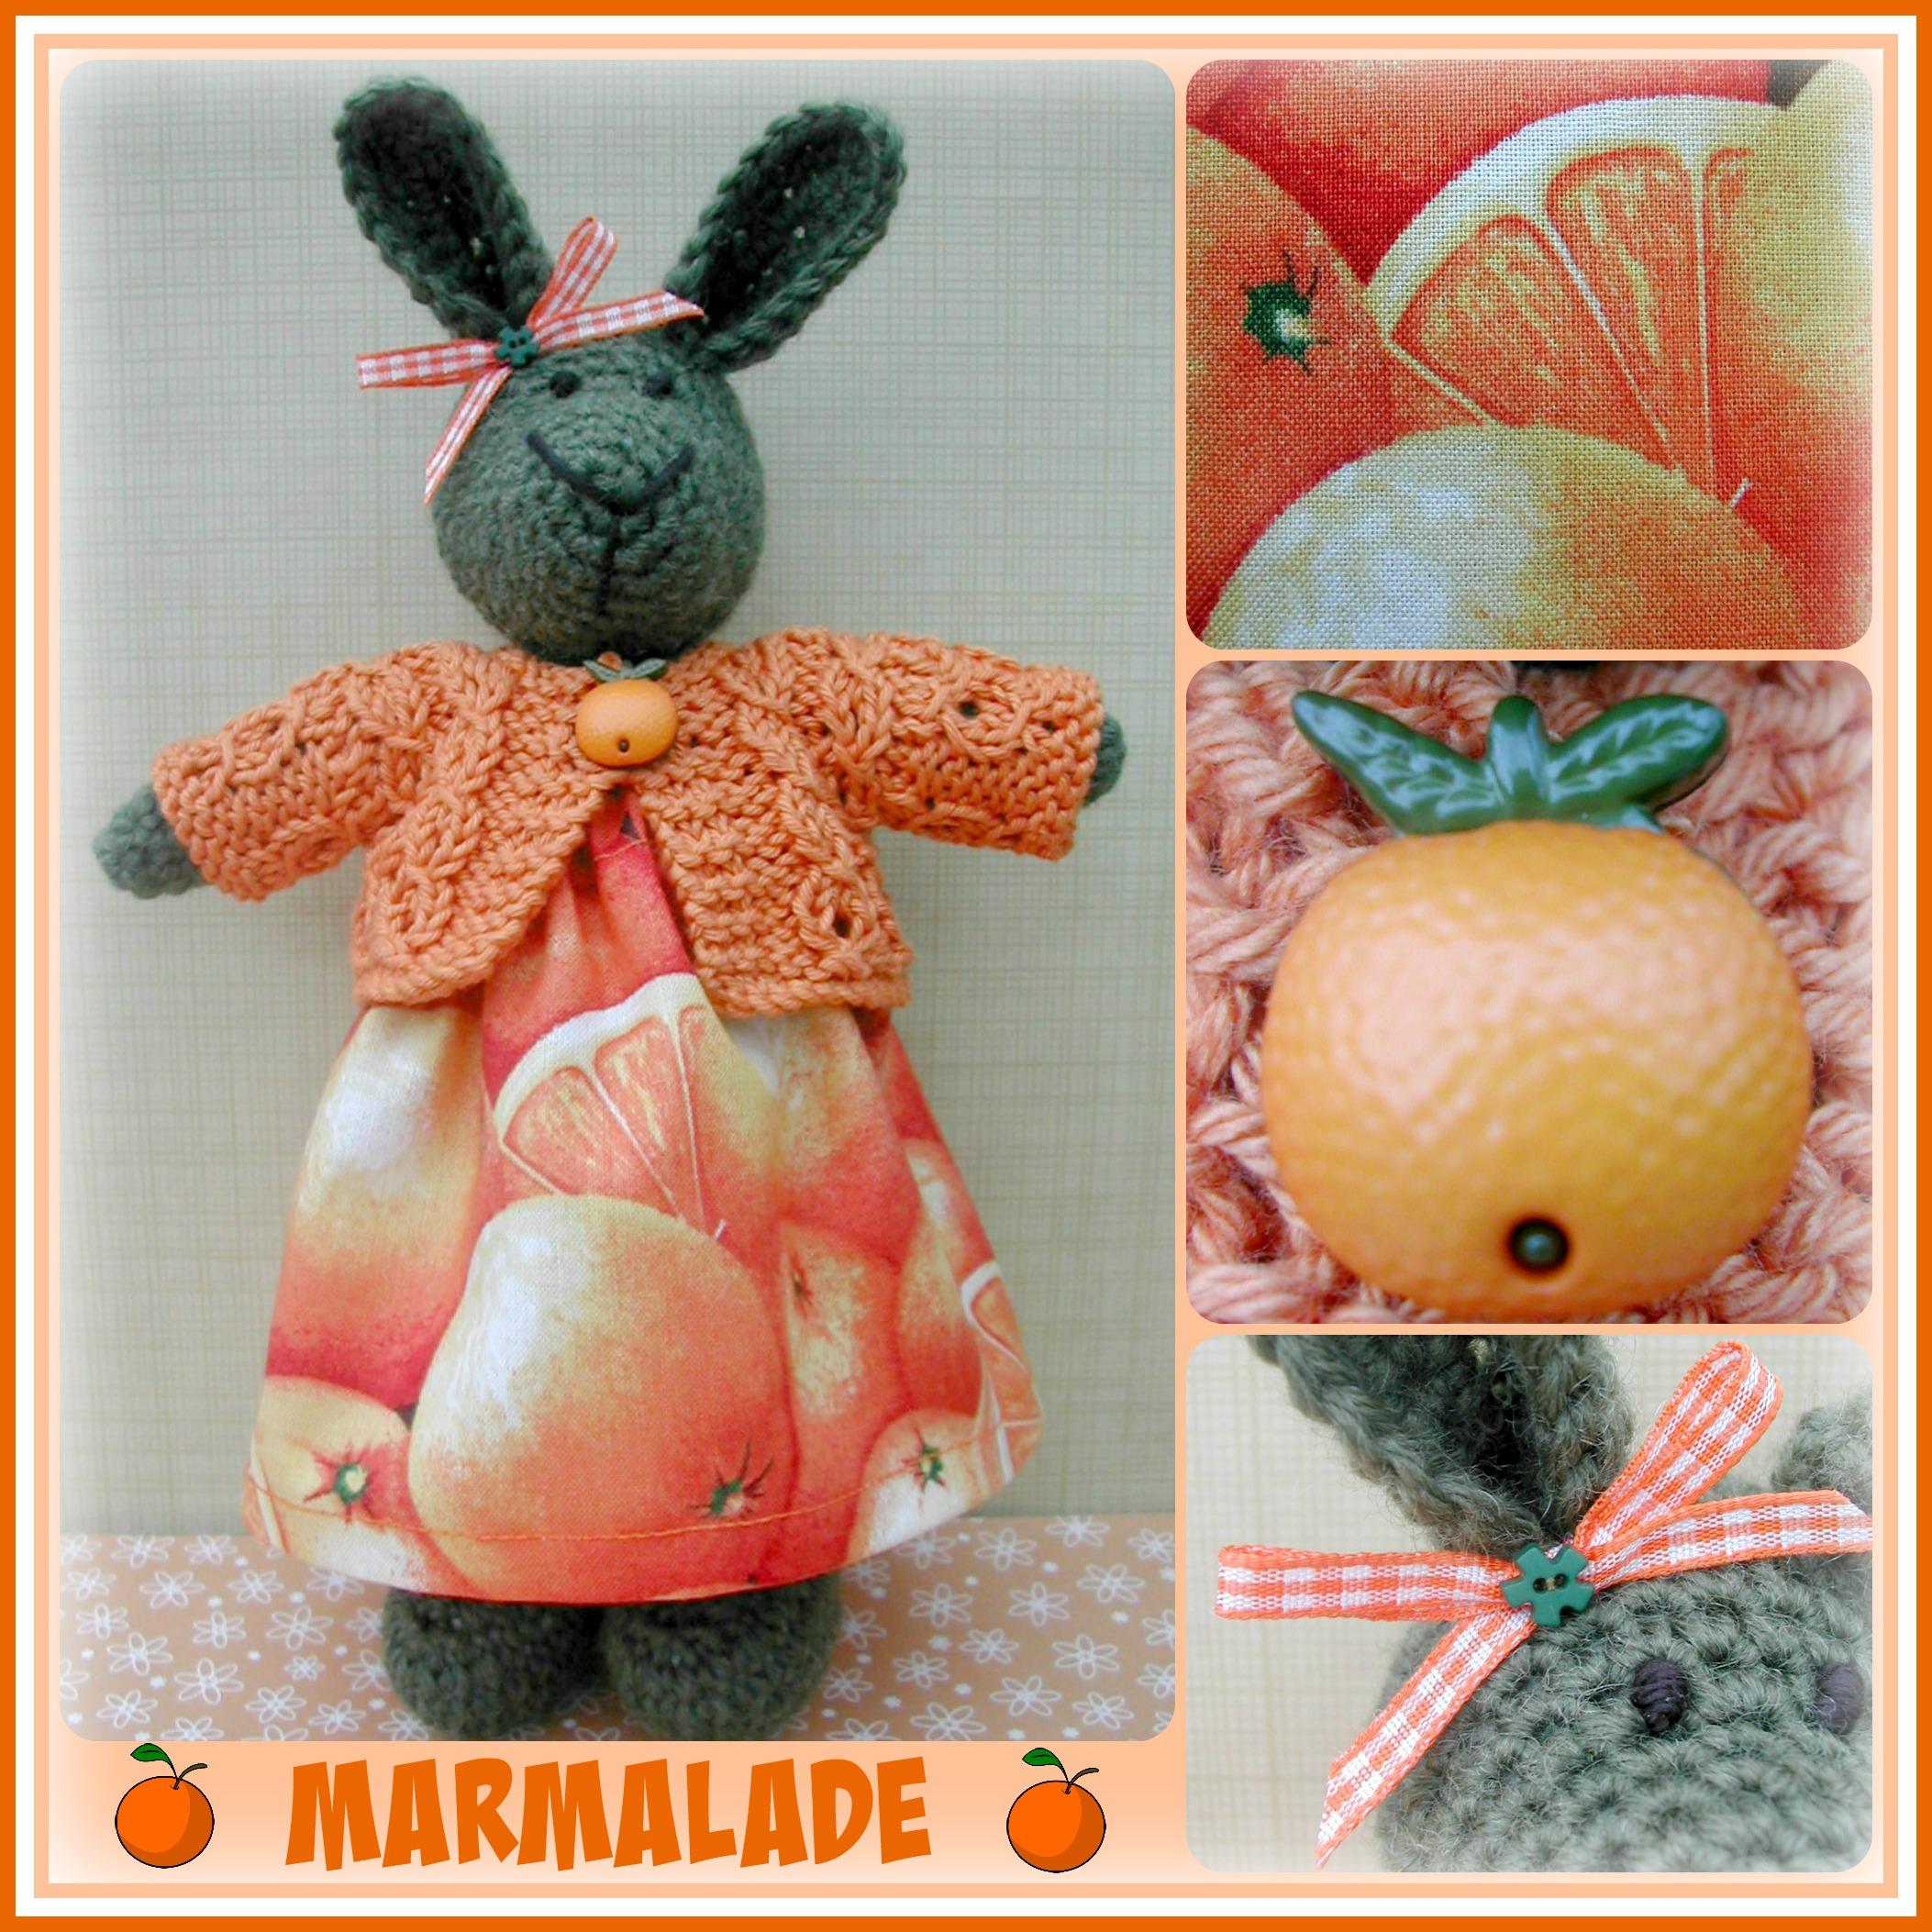 Marmalade Collage